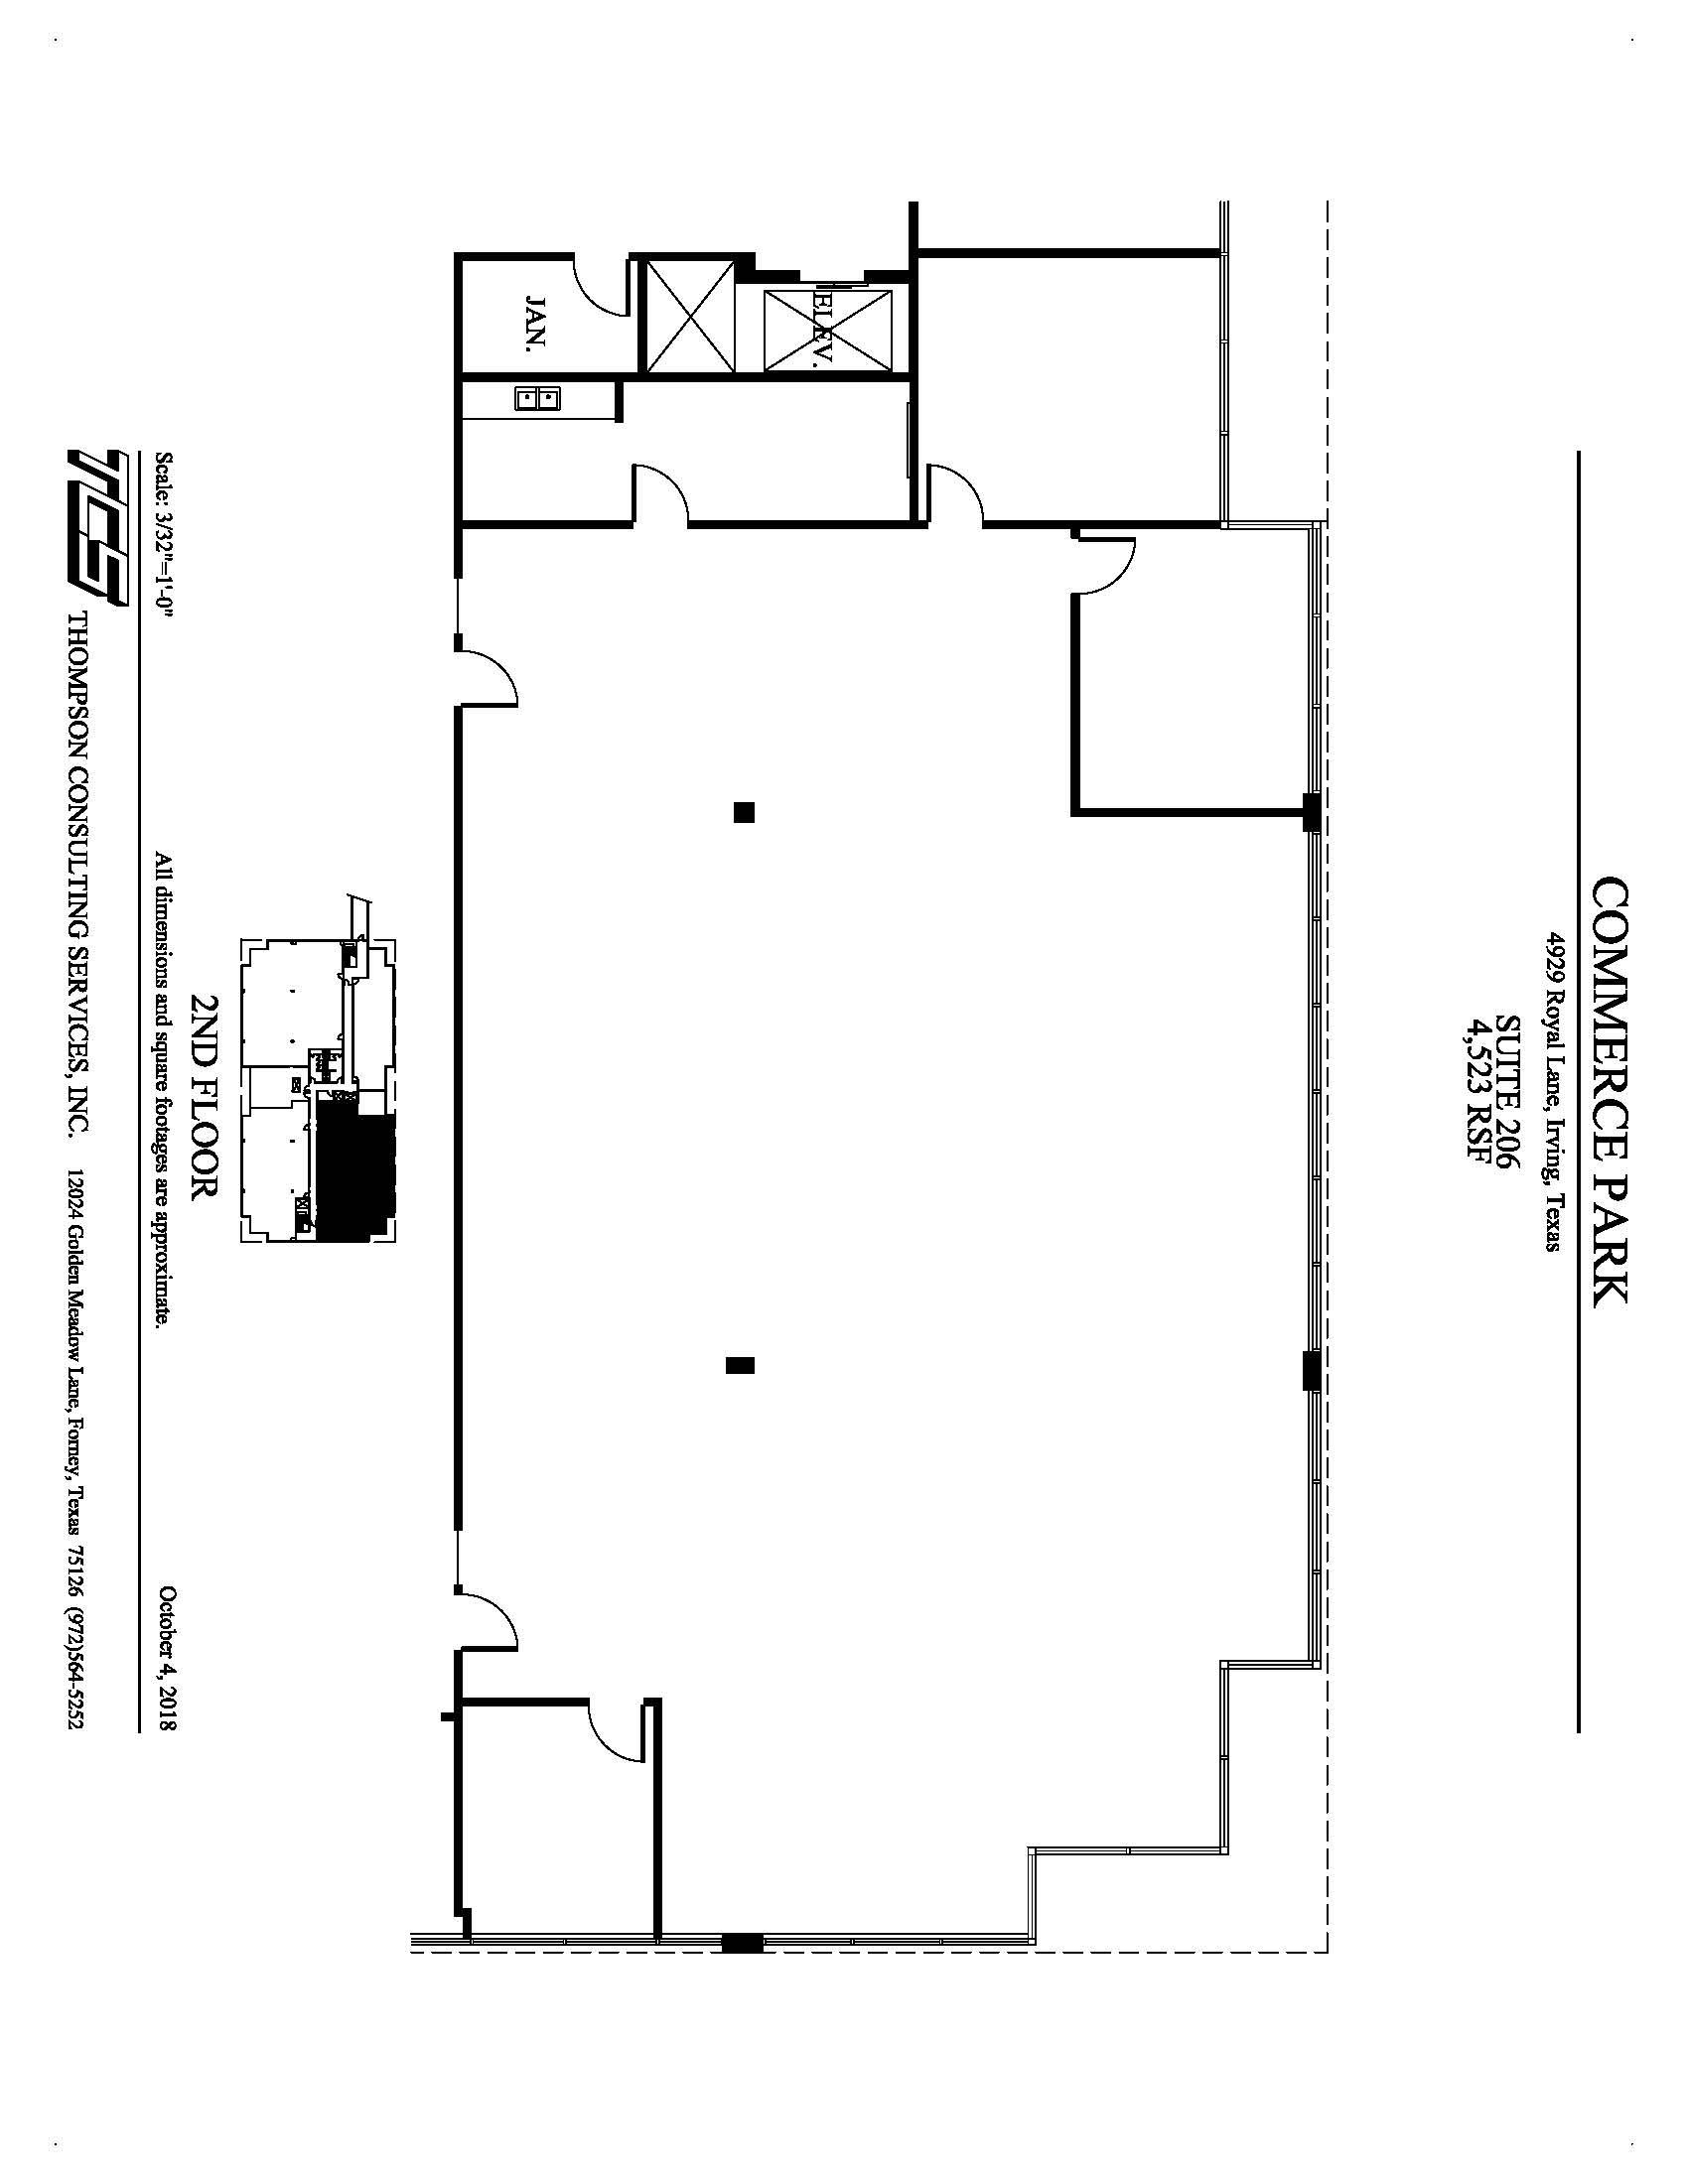 Commerce Park - 4929 Royal Lane - Suite 206 - Marketing Plan.jpg